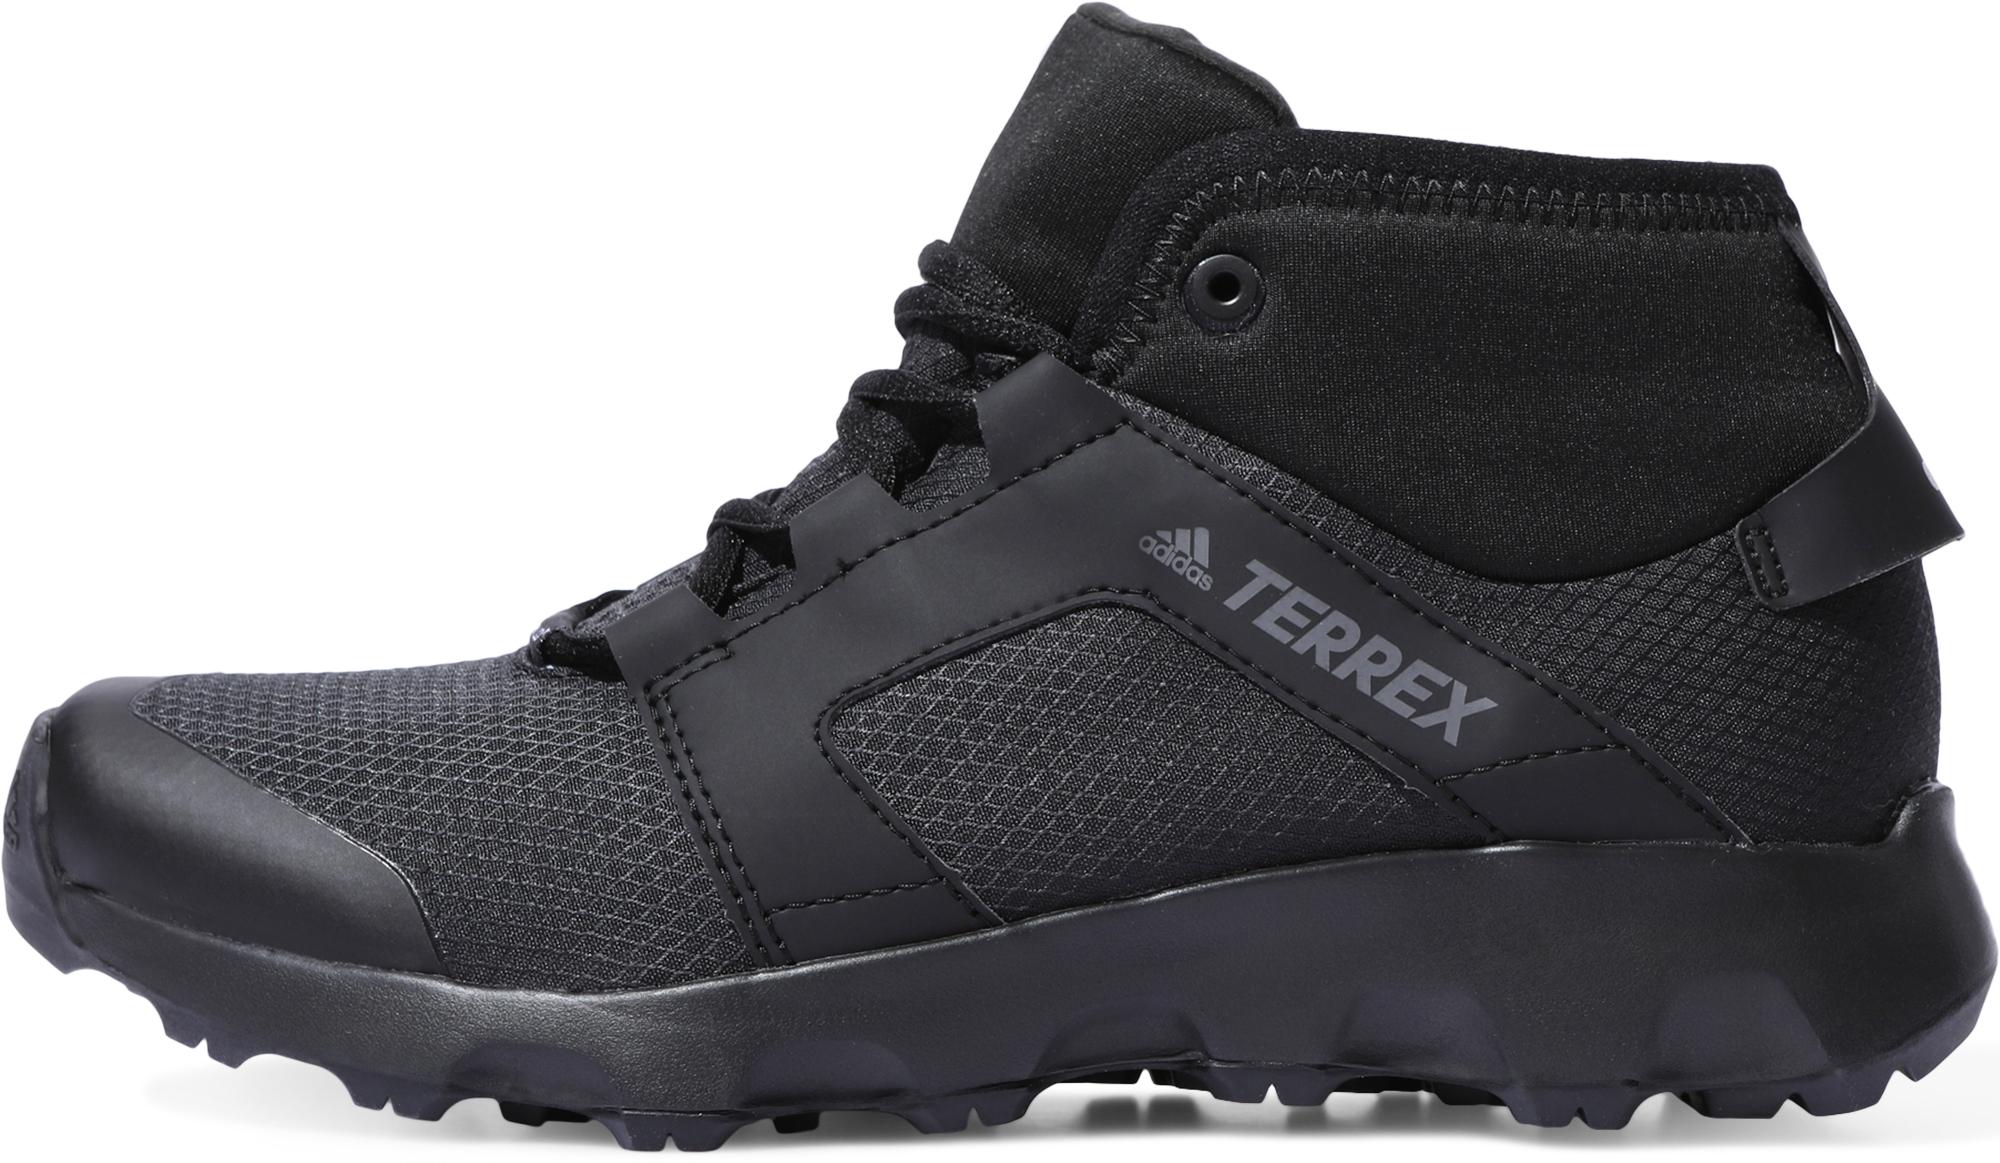 Adidas Ботинки утепленные женские Adidas Terrex Voyager, размер 40 adidas ботинки мужские adidas terrex tivid mid climaproof размер 40